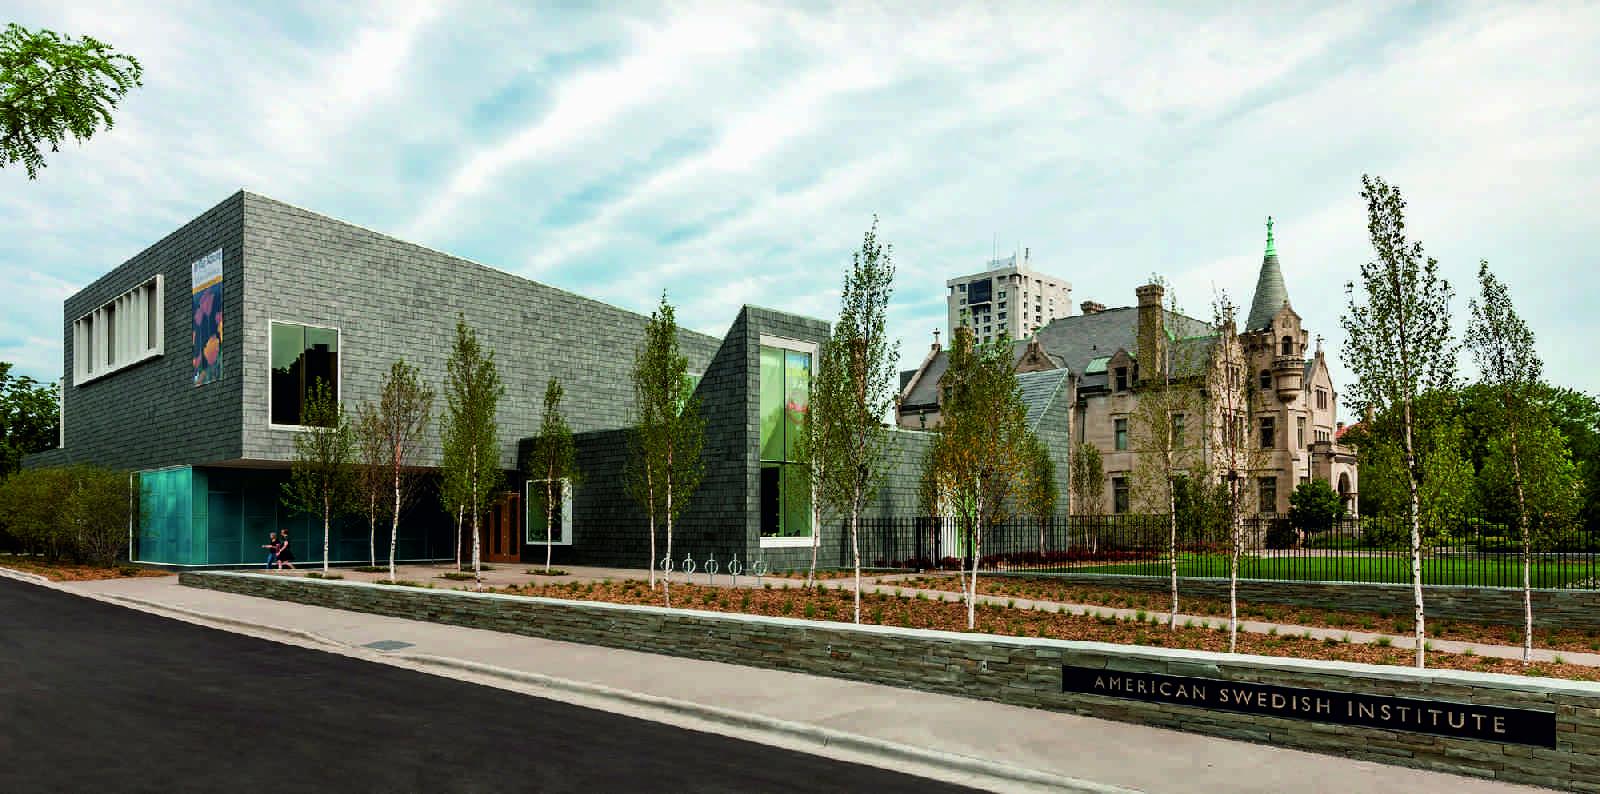 Swedish institute s nelson cultural center by hga a as - Interior design classes minneapolis ...